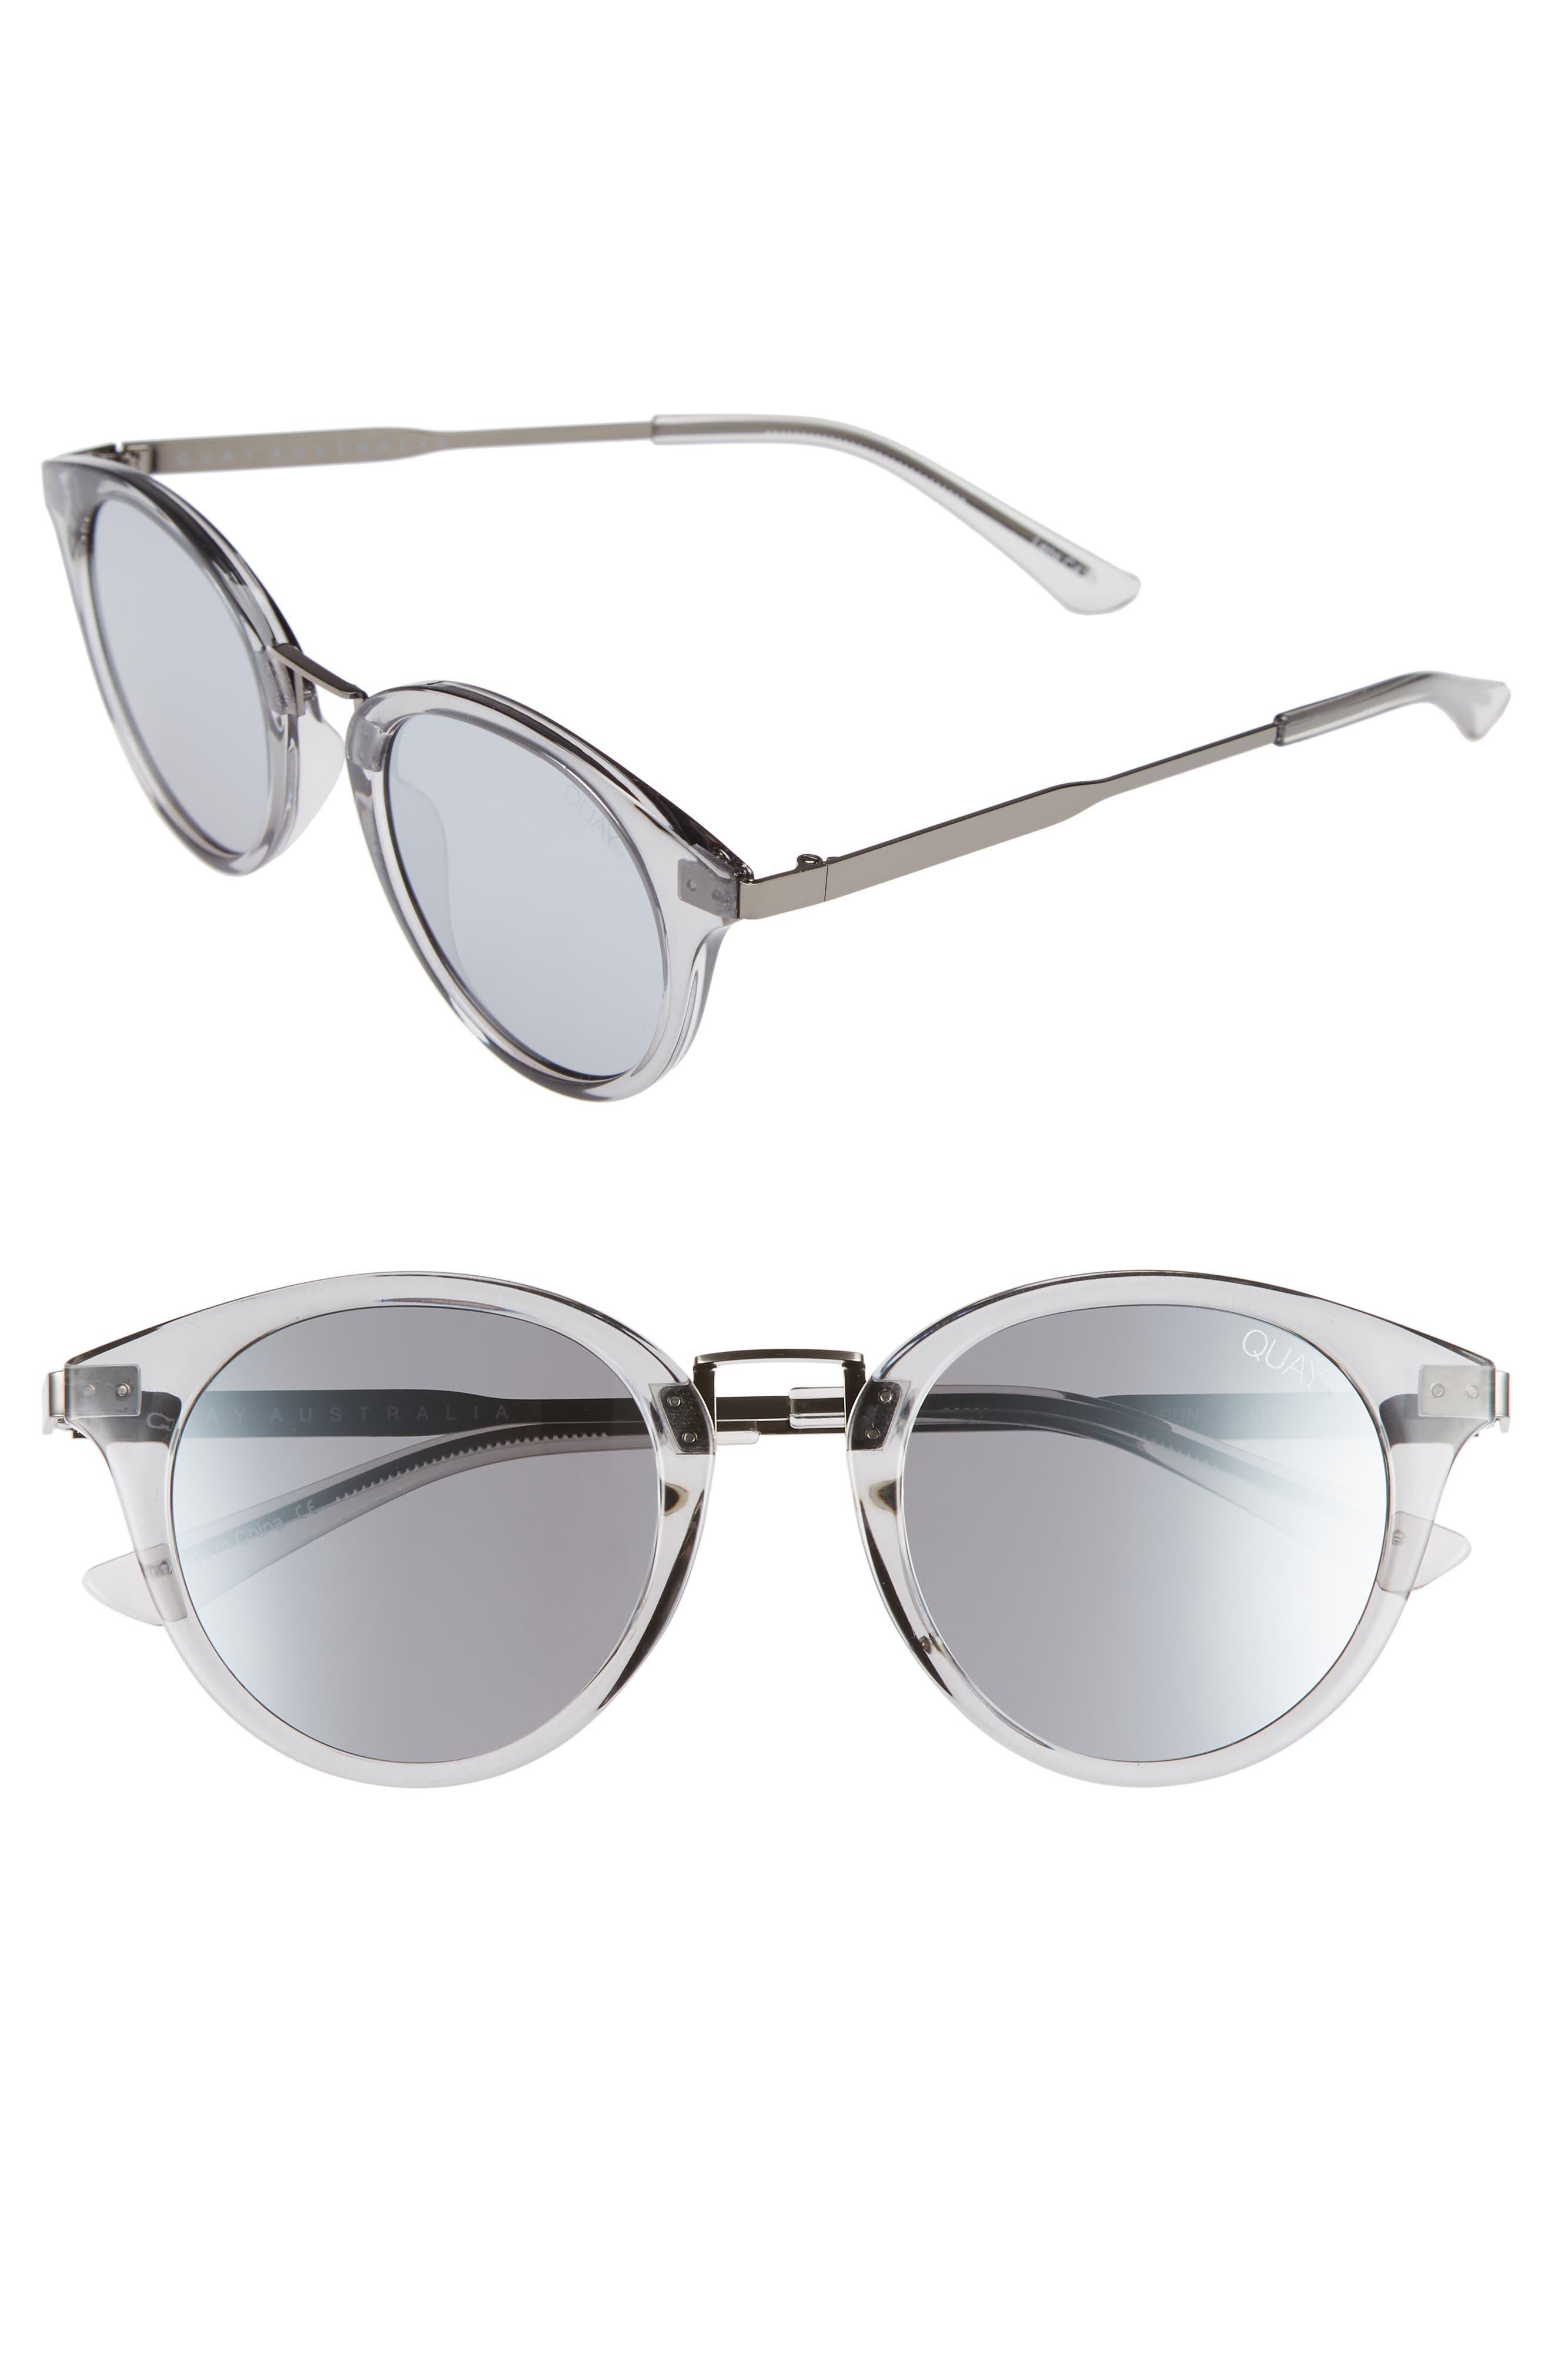 Gotta Run 48mm Sunglasses,                             Main thumbnail 1, color,                             Grey/ Silver